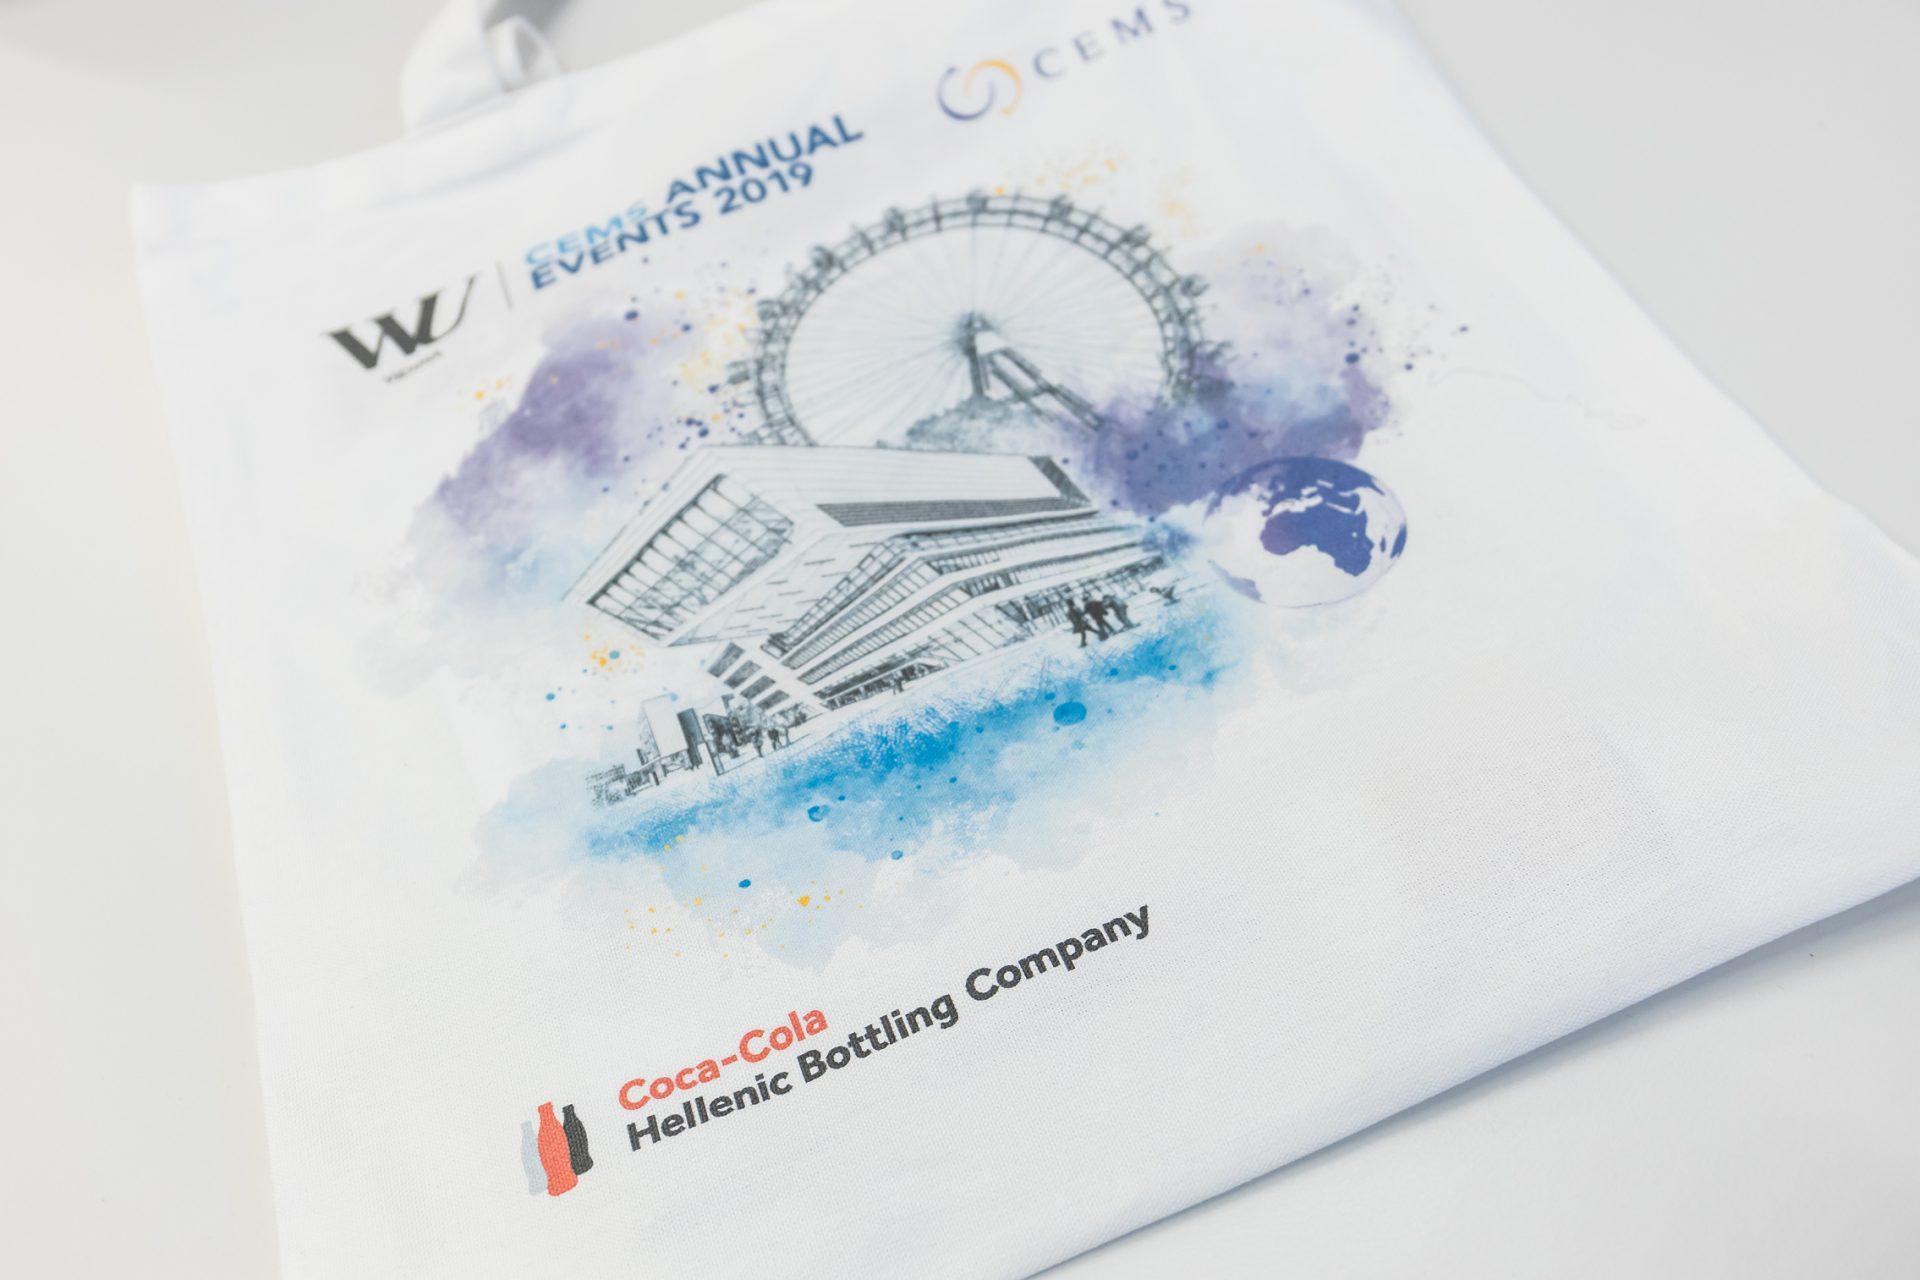 6H5A4467_20191128_CEMS_ANNUAL_EVENTS_2019_VIENNA